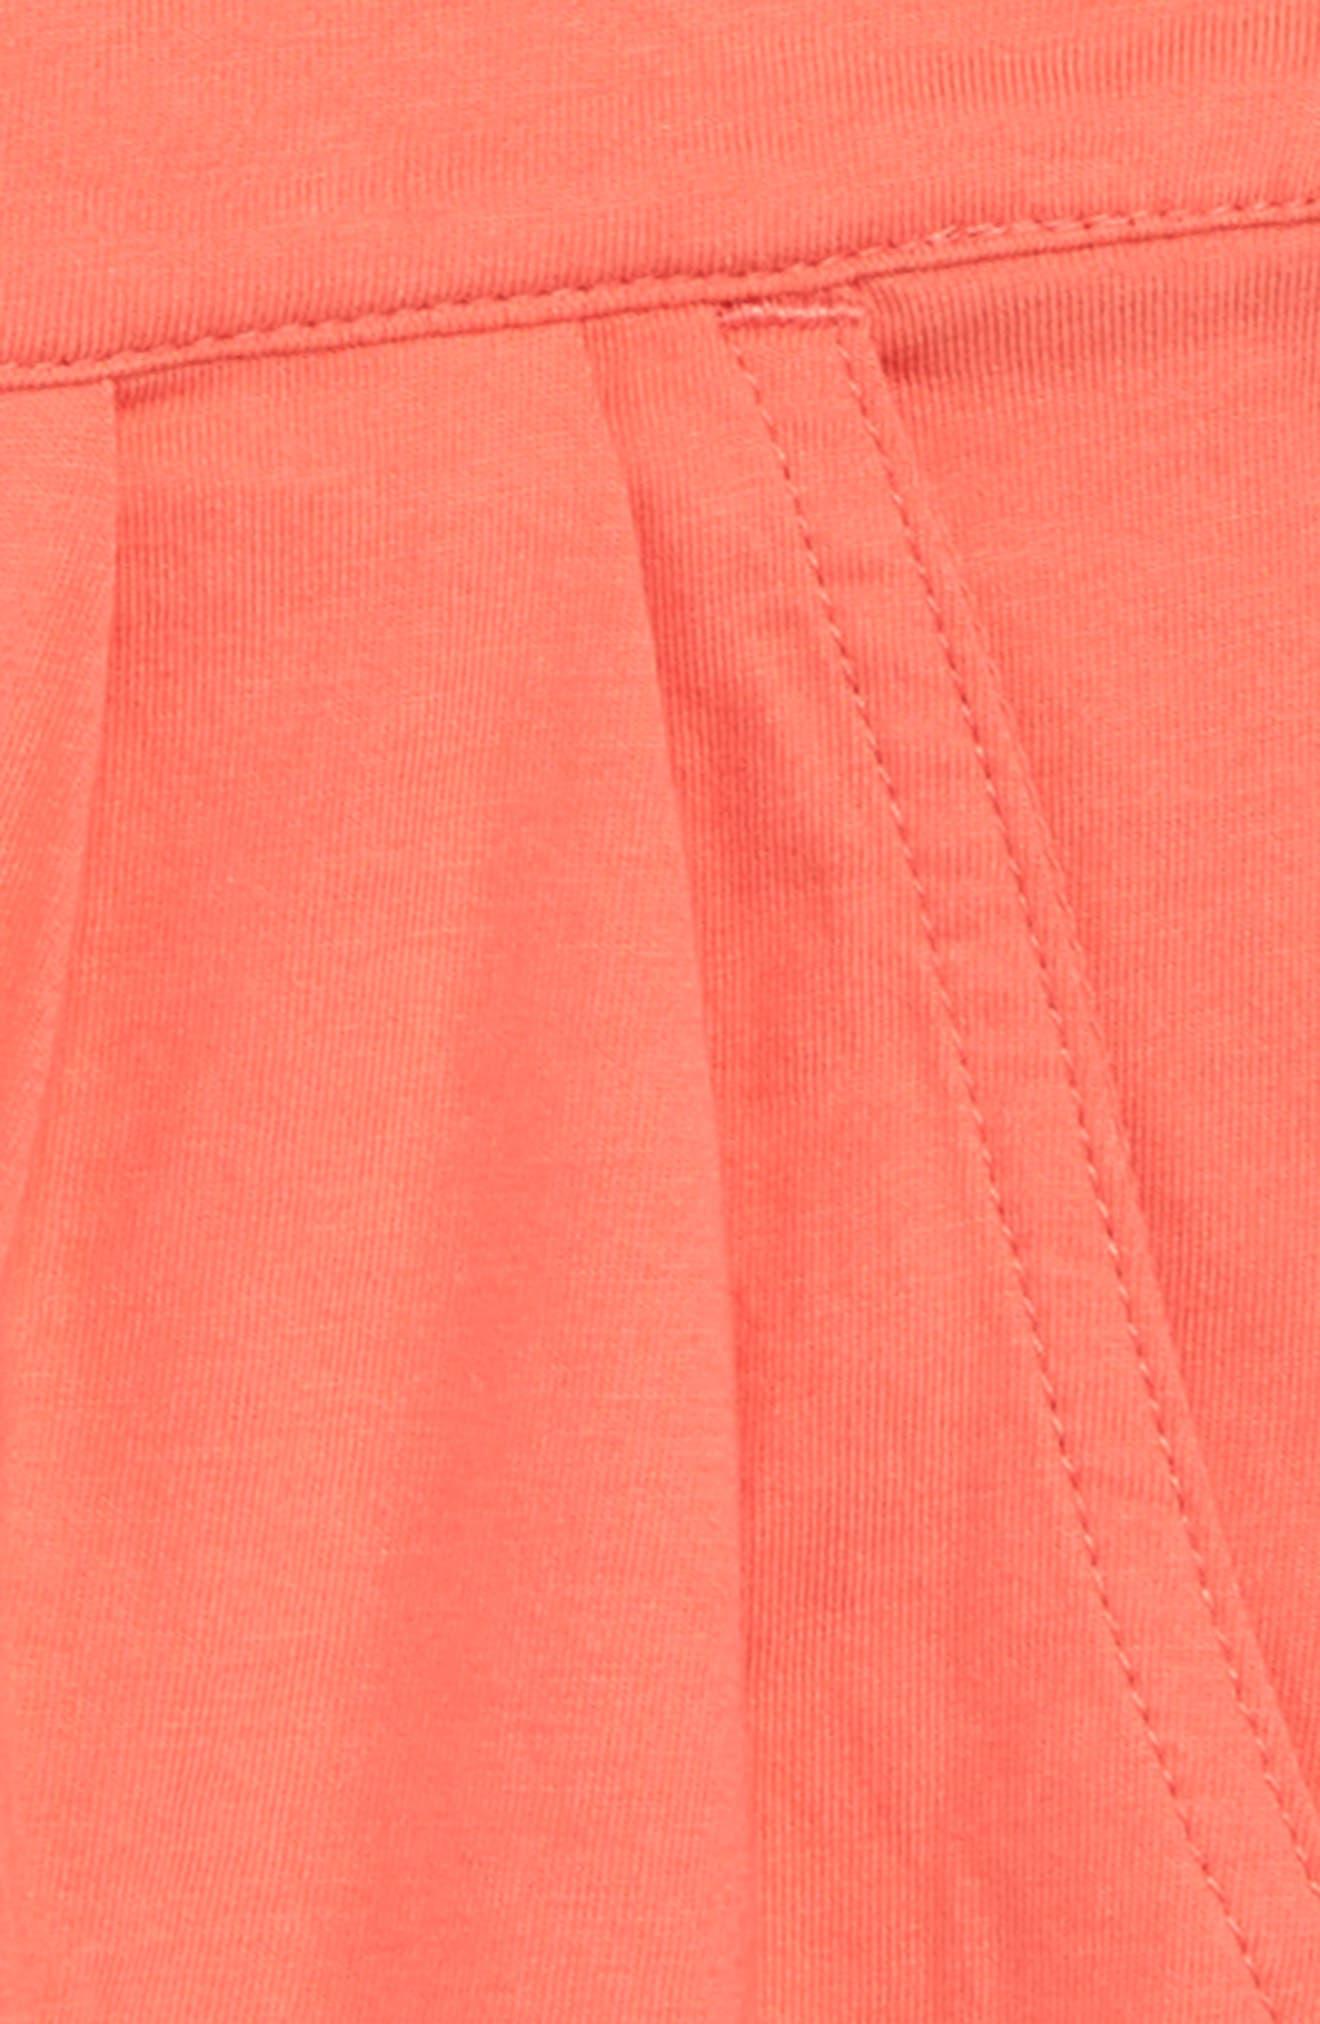 Boat Dock Shorts,                             Alternate thumbnail 6, color,